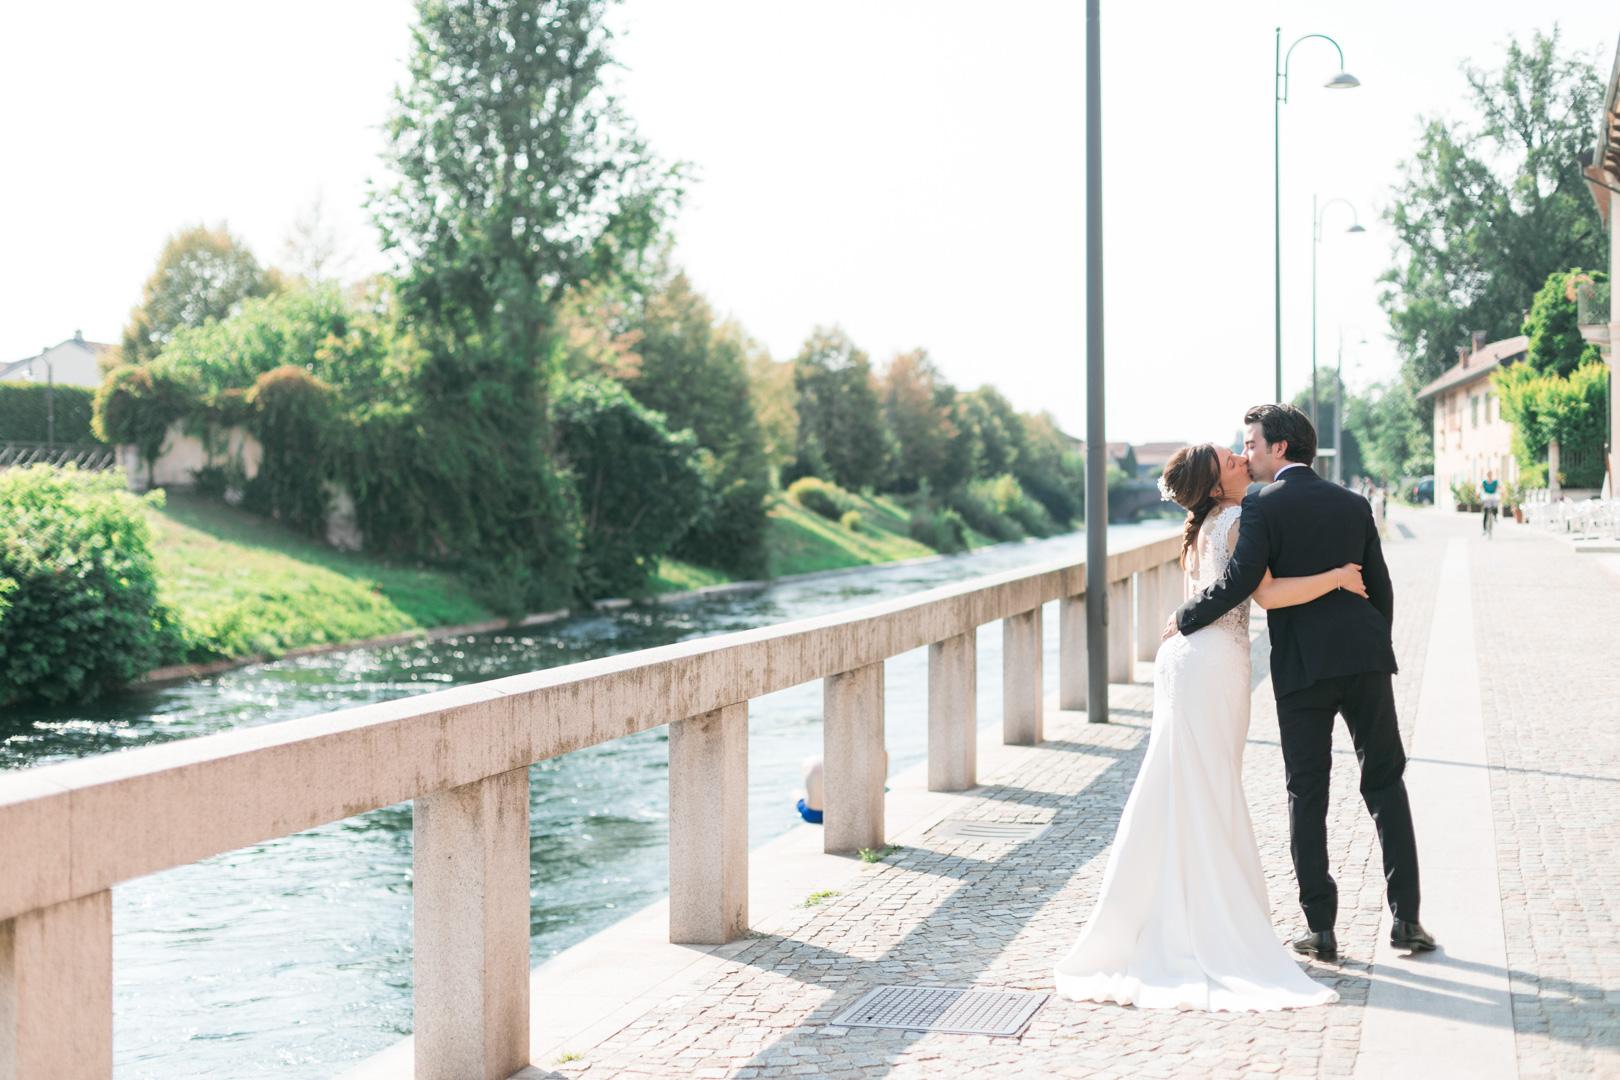 Andreas_Pinacci_Wedding_Photographer-18.